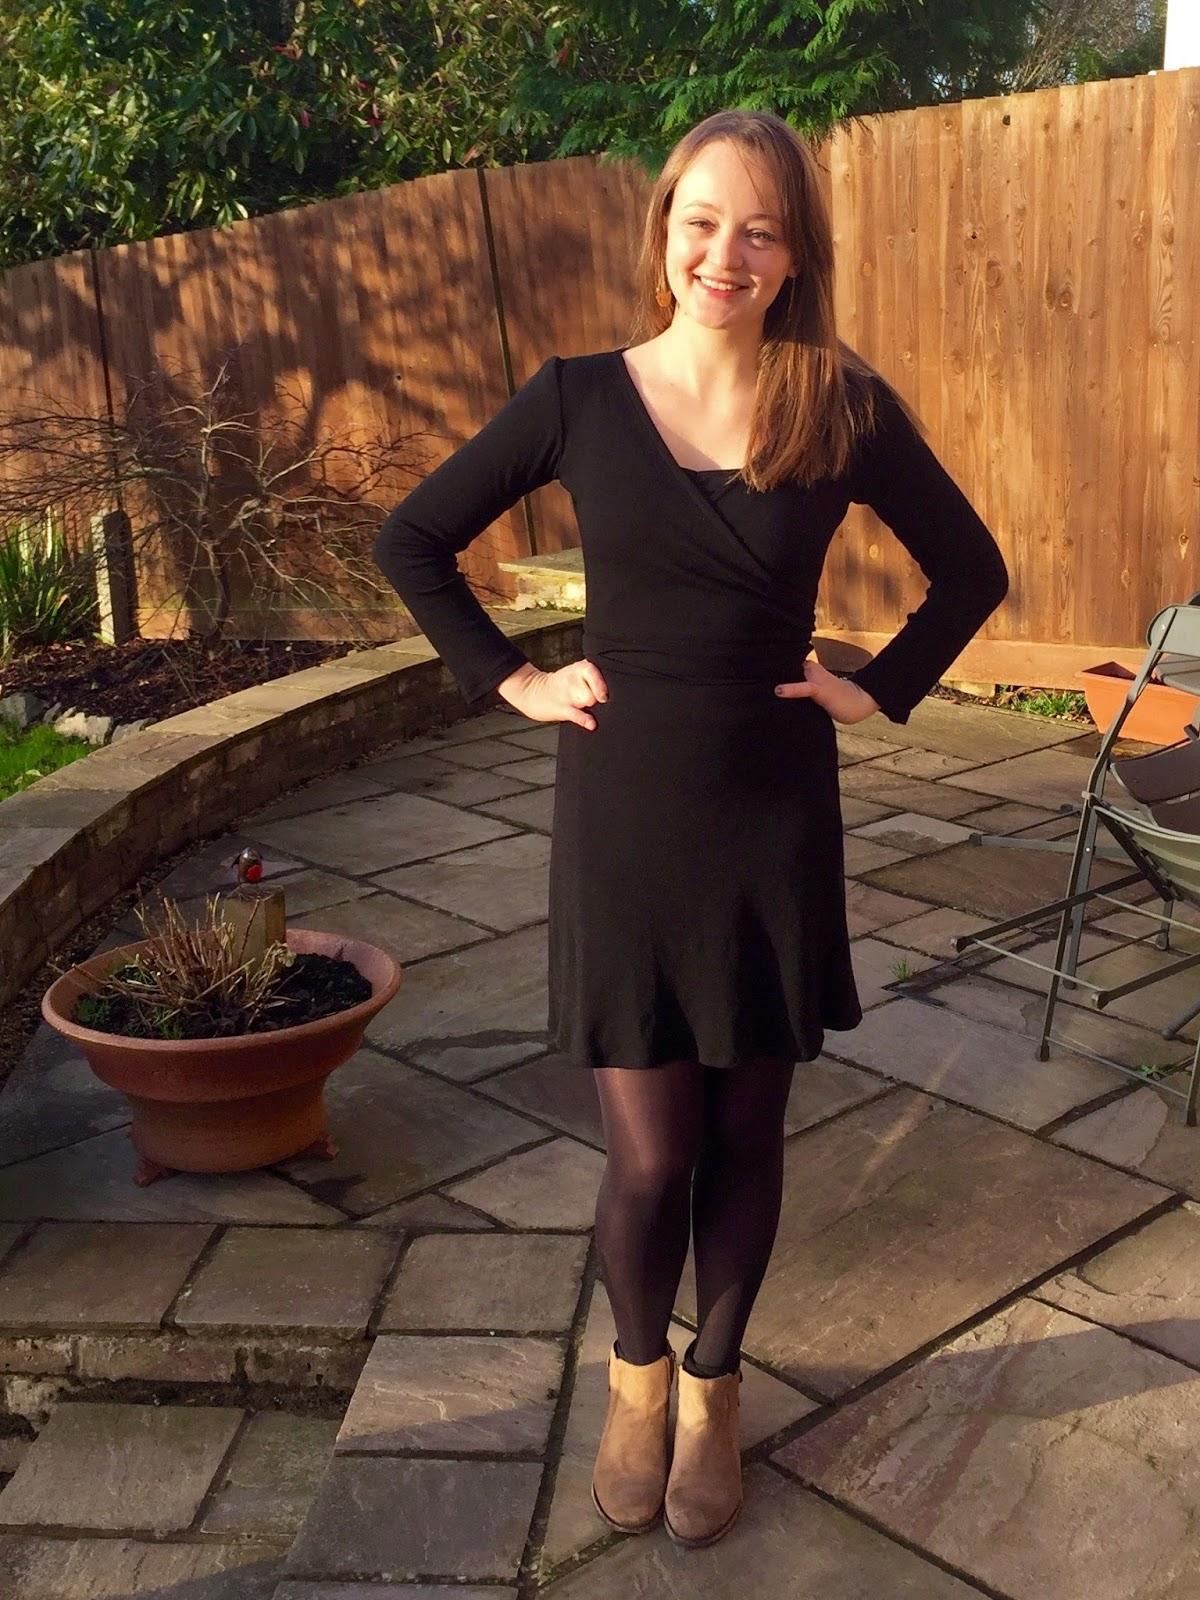 59721a2c149908 Merino Wool Ultimate Wrap Dress | Diary of a Chain Stitcher | Bloglovin'